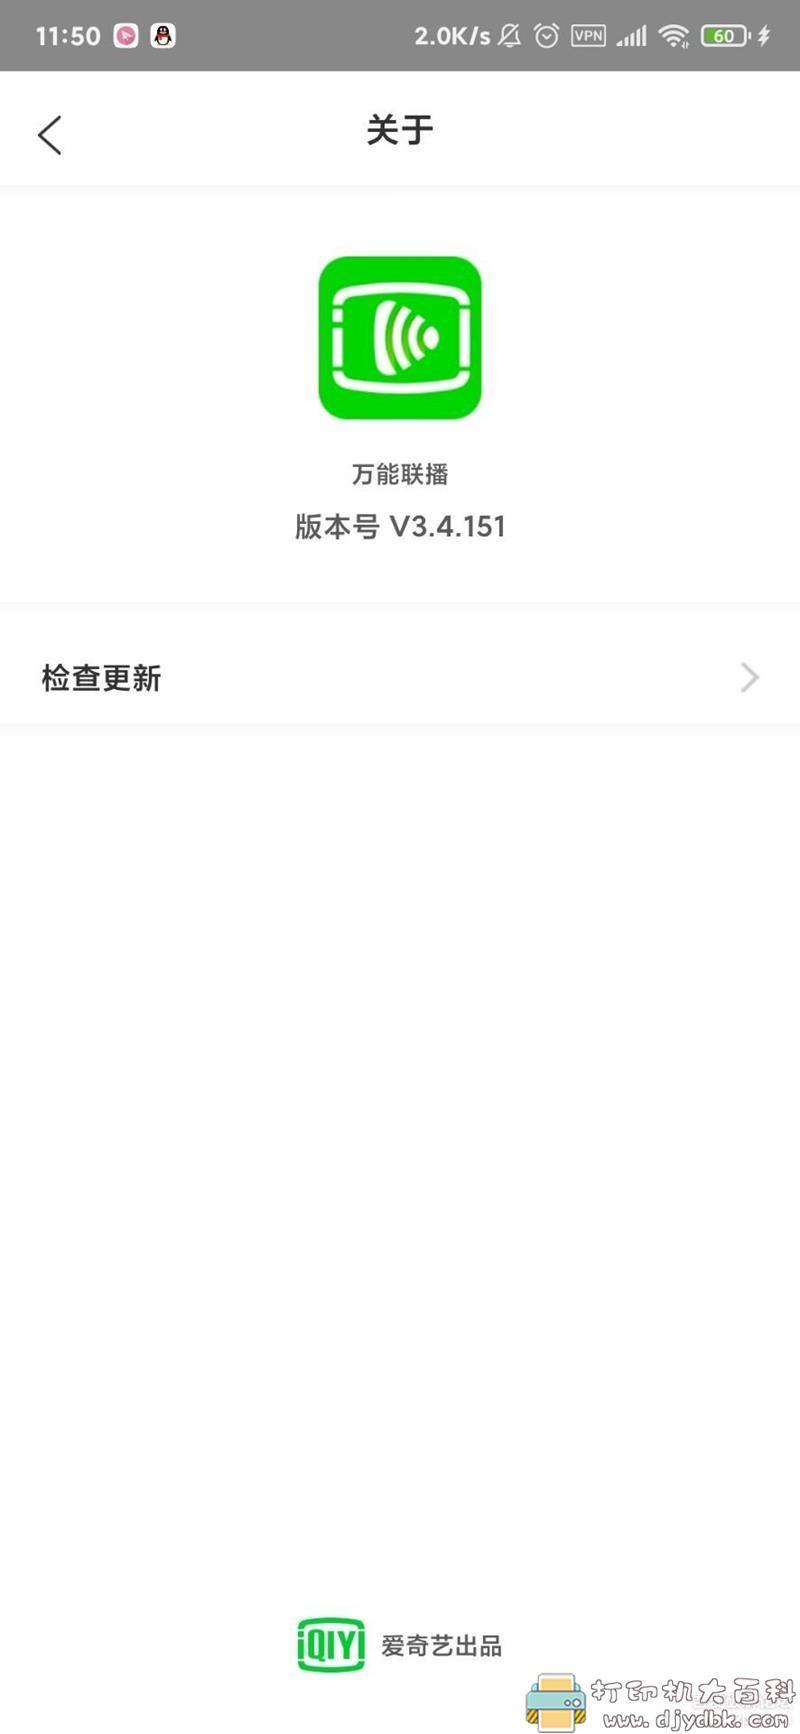 [Android]爱奇艺出品的万能播放和快传工具 万能联播V3.4.151 Googleplay版 配图 No.1